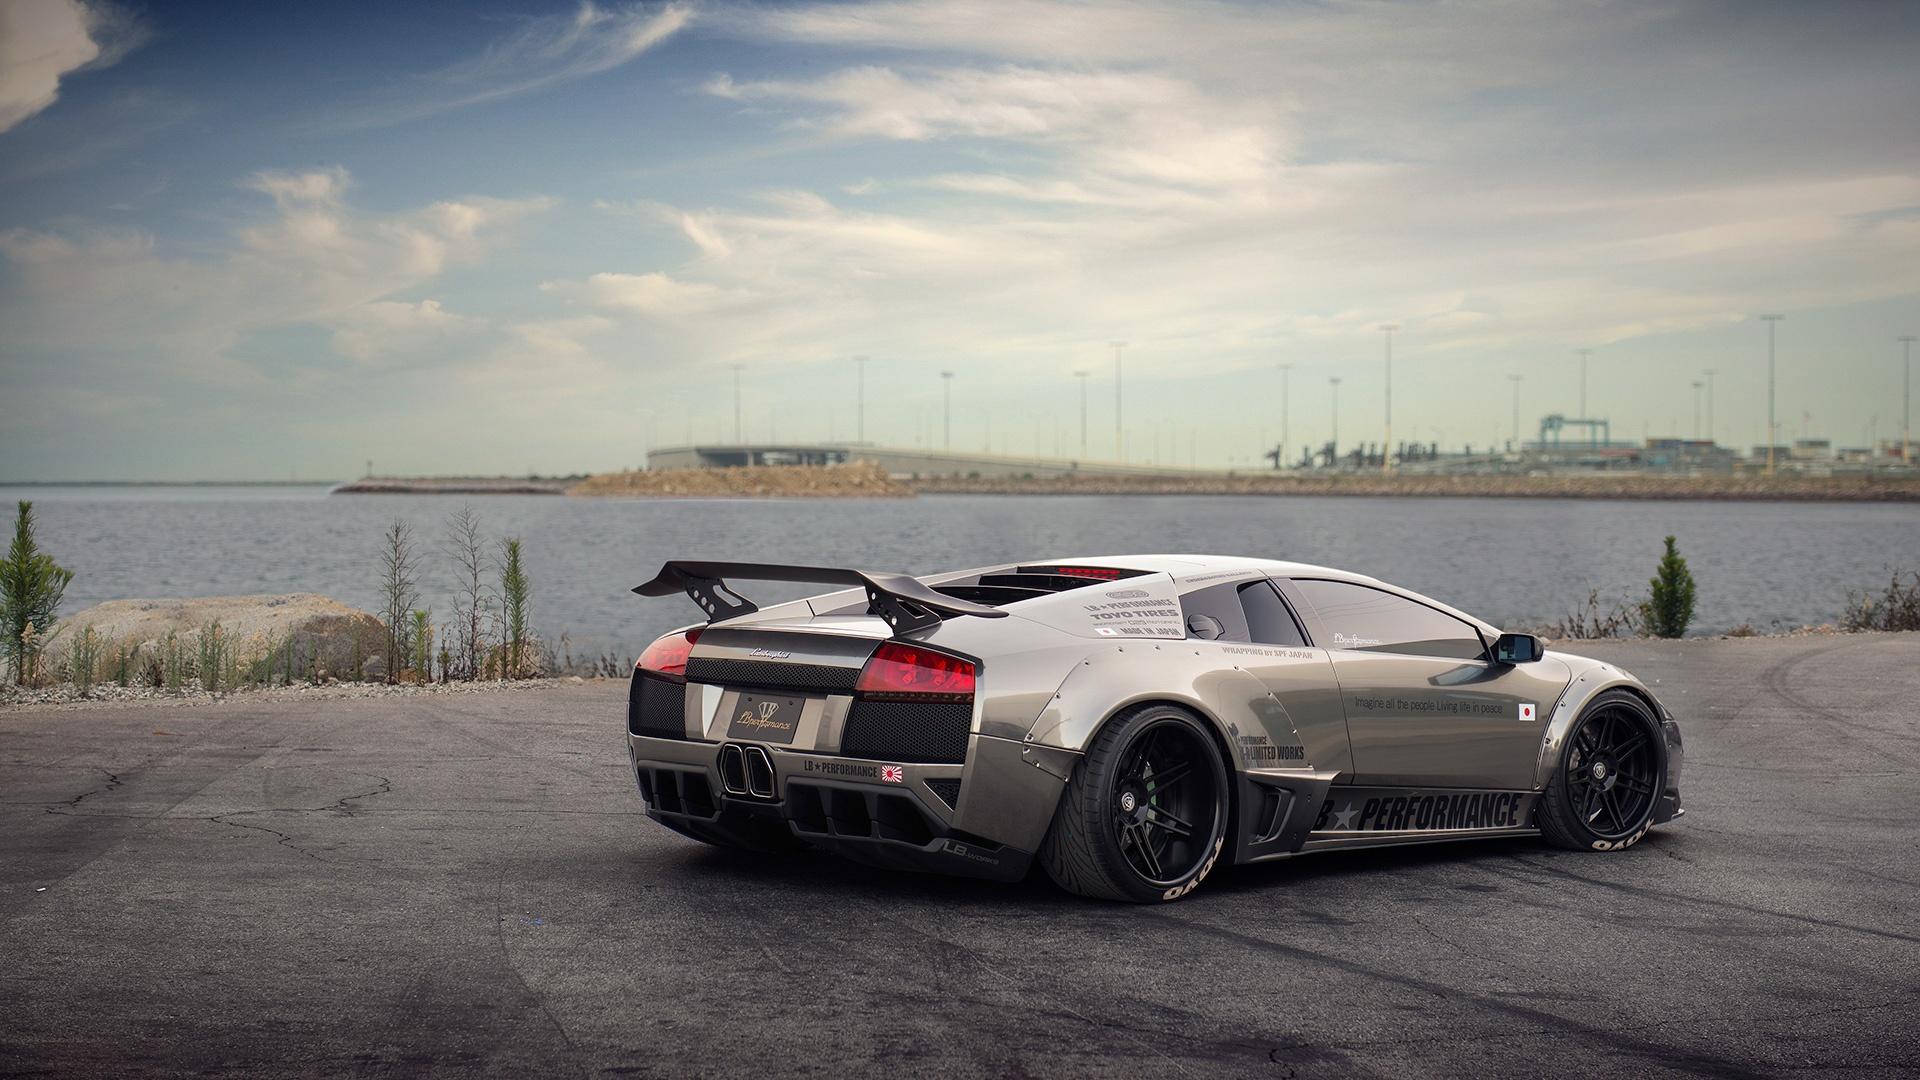 Pagani Zonda Car Wallpaper Lamborghini Aventador Wallpapers Pictures Images